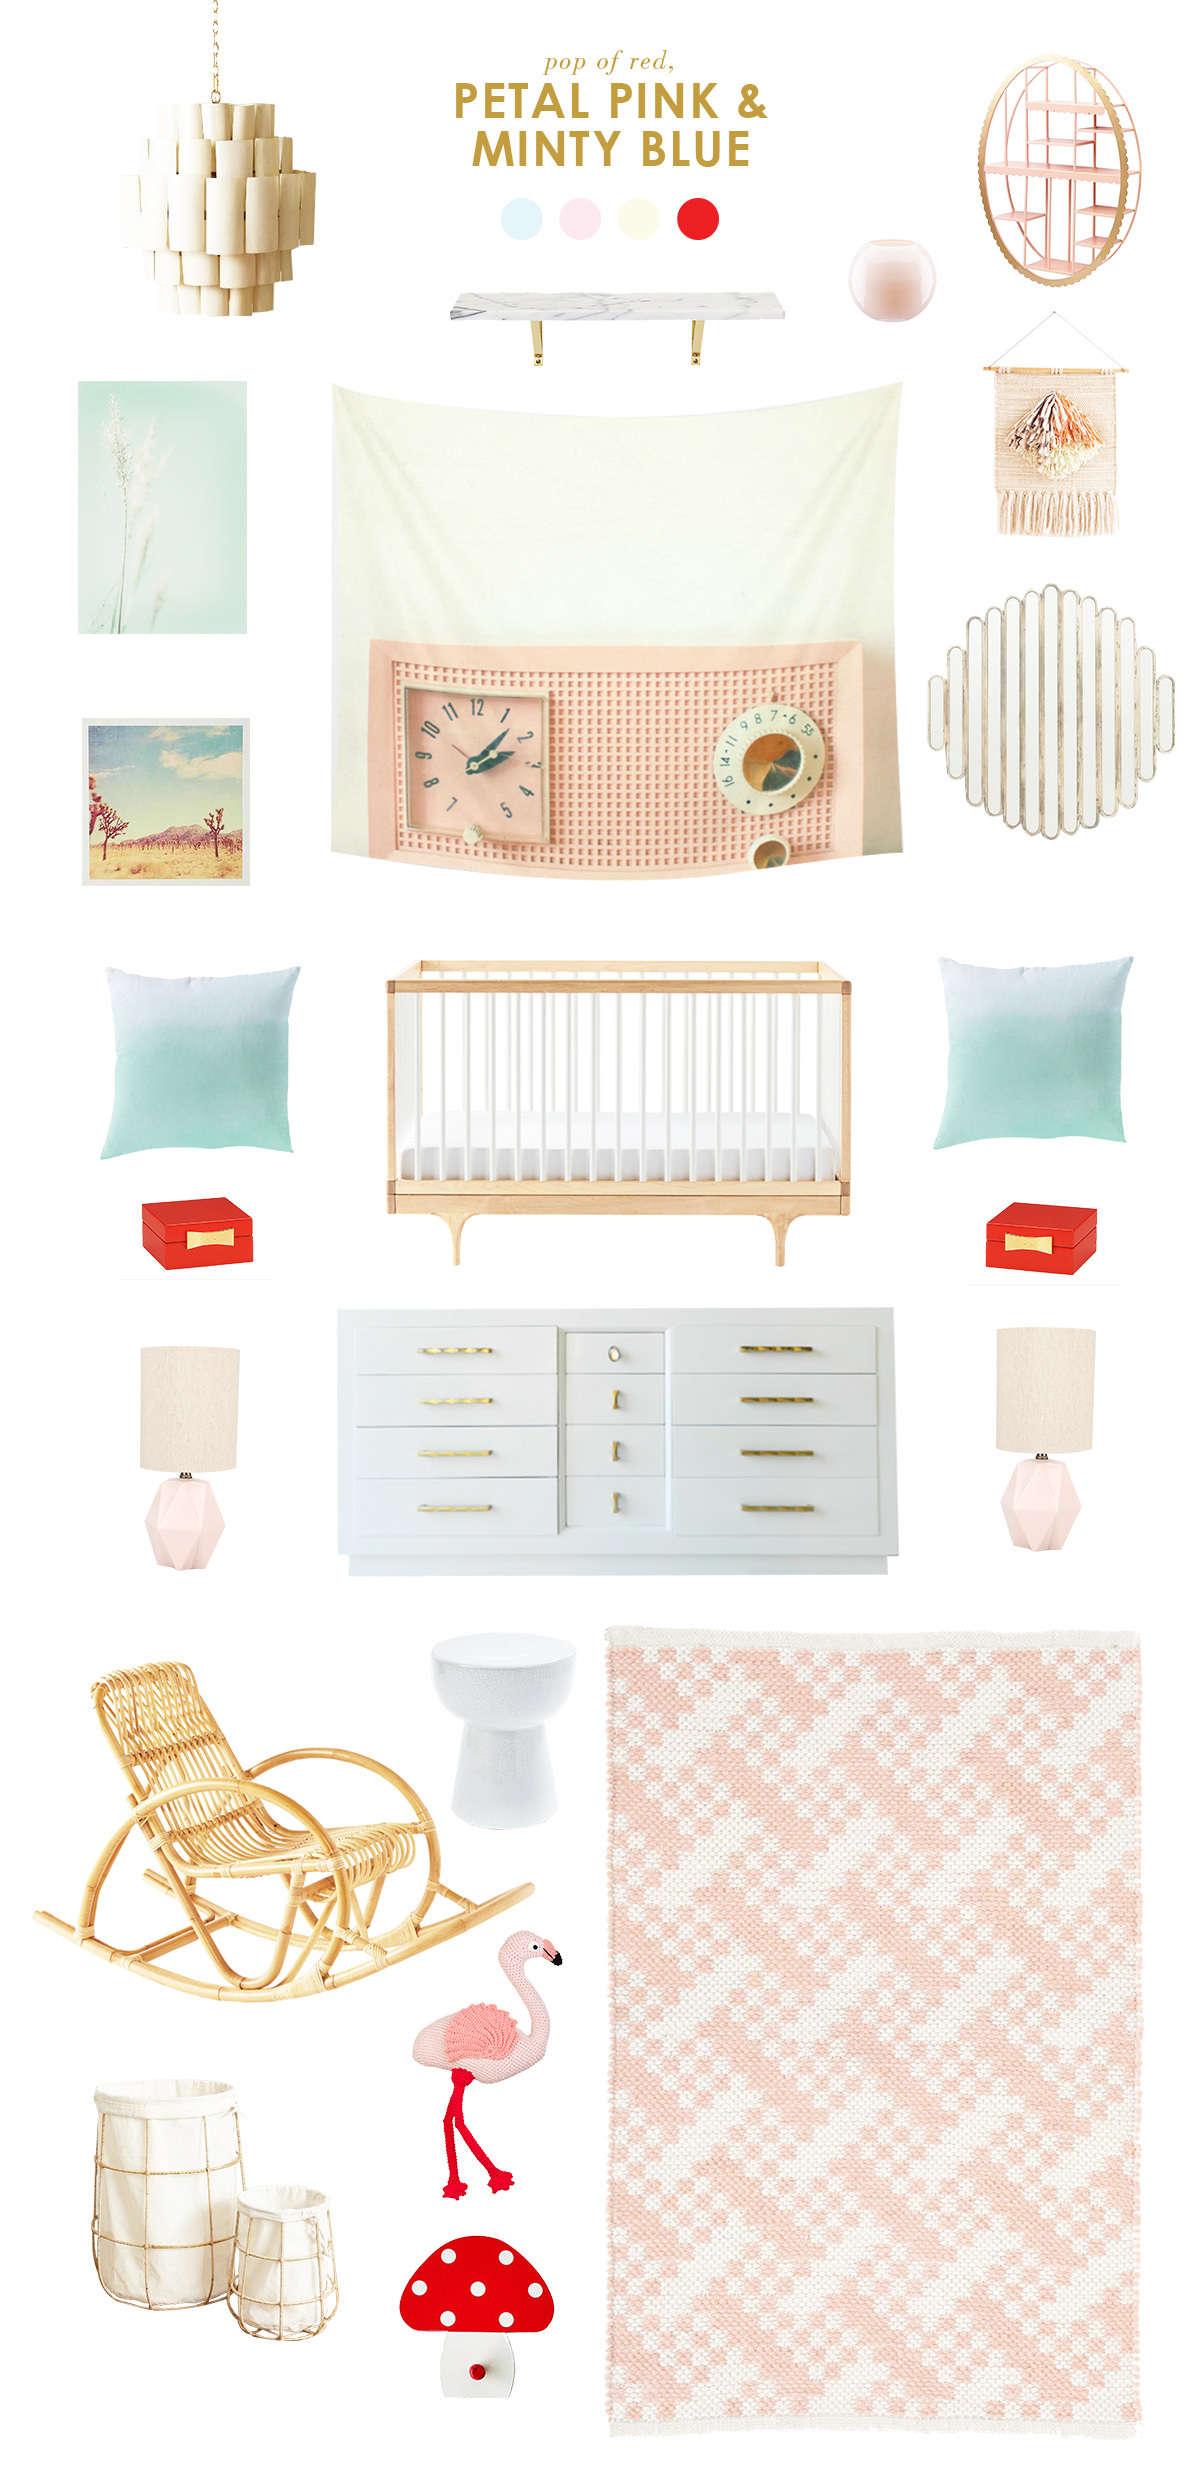 Petal Pink Minty Blue Nursery Ideas Lay Baby Lay